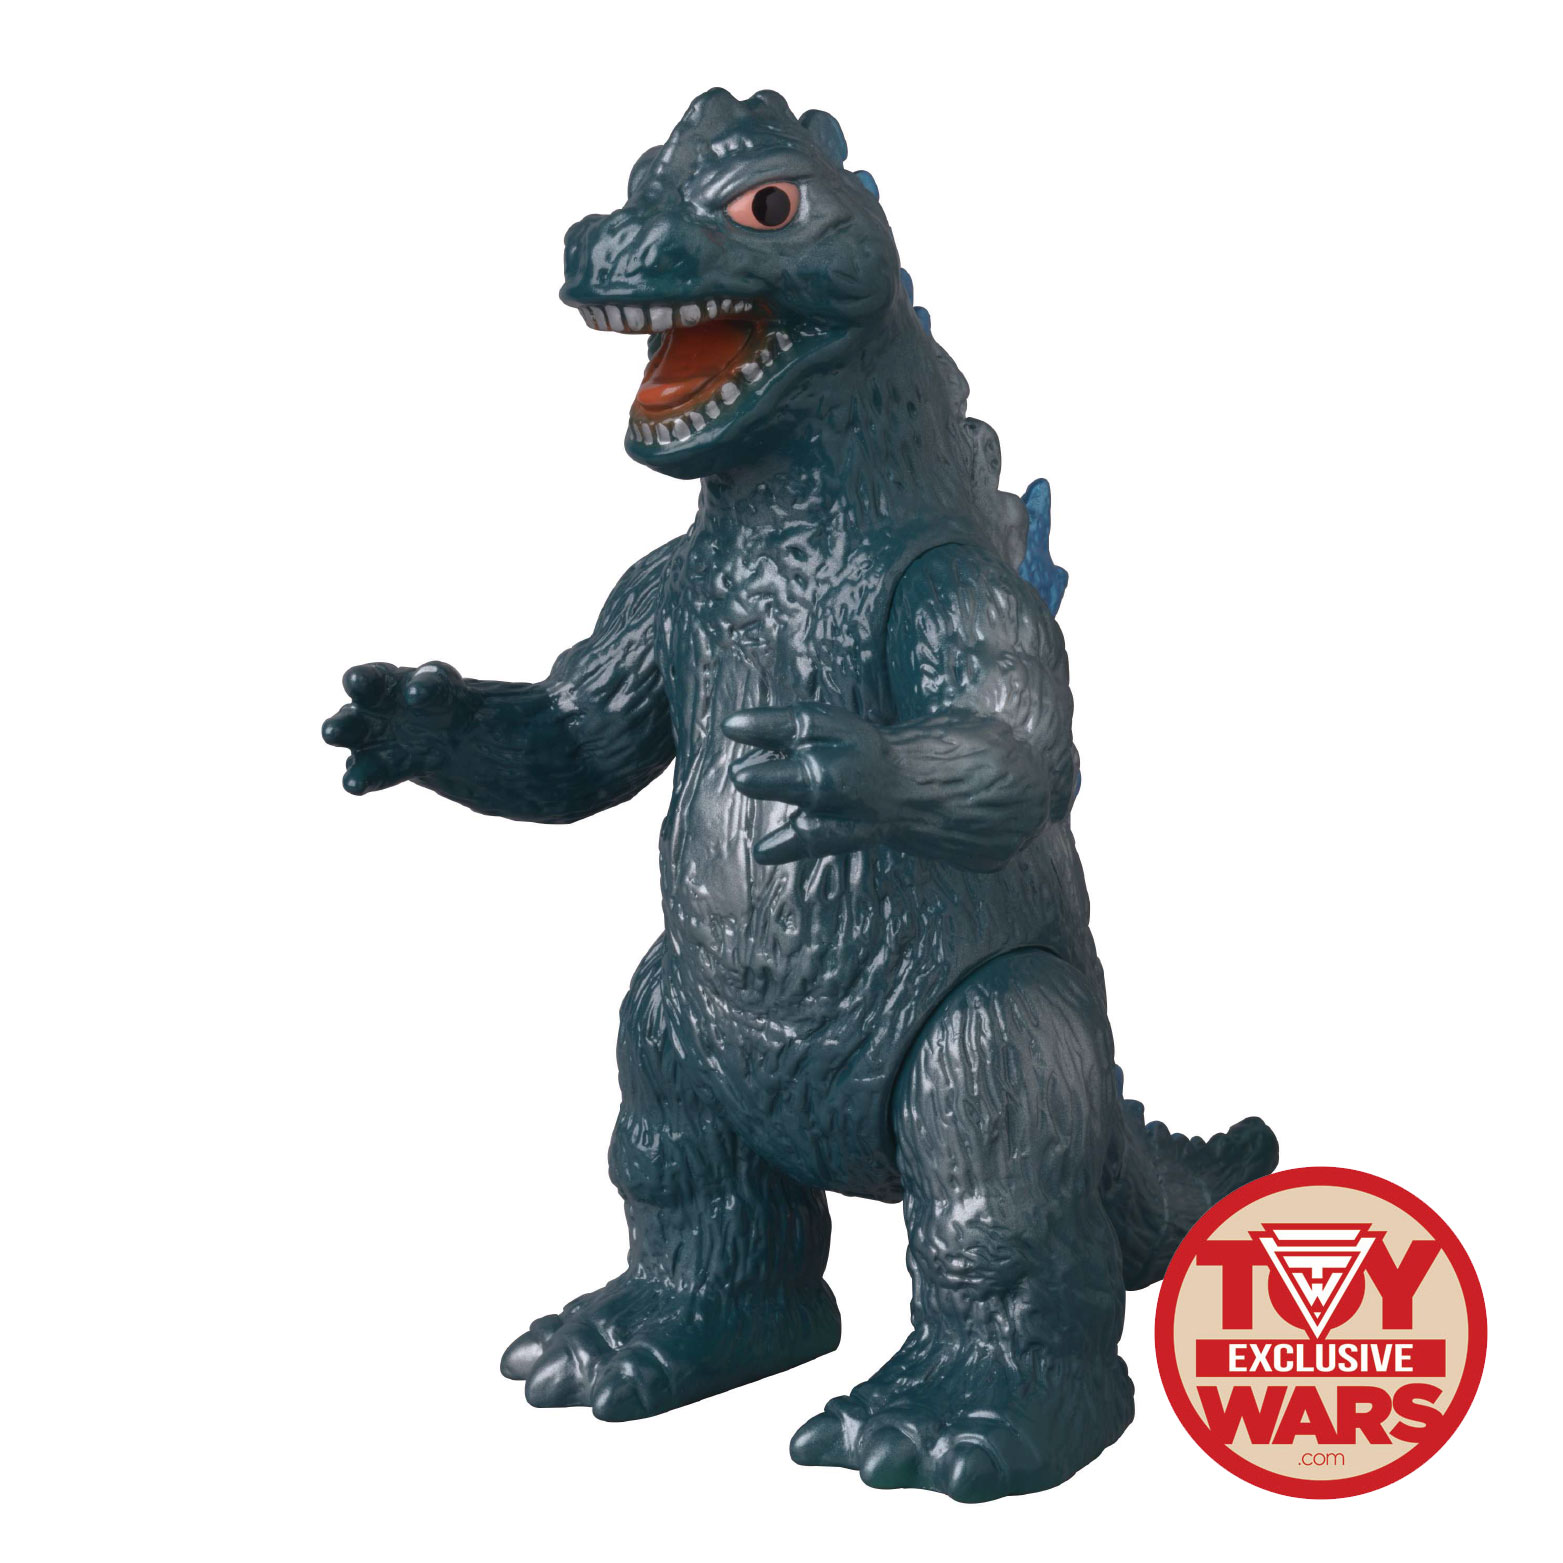 Toy Wars Exclusive Godzilla Vinyl Wars Bullmark Sofubi